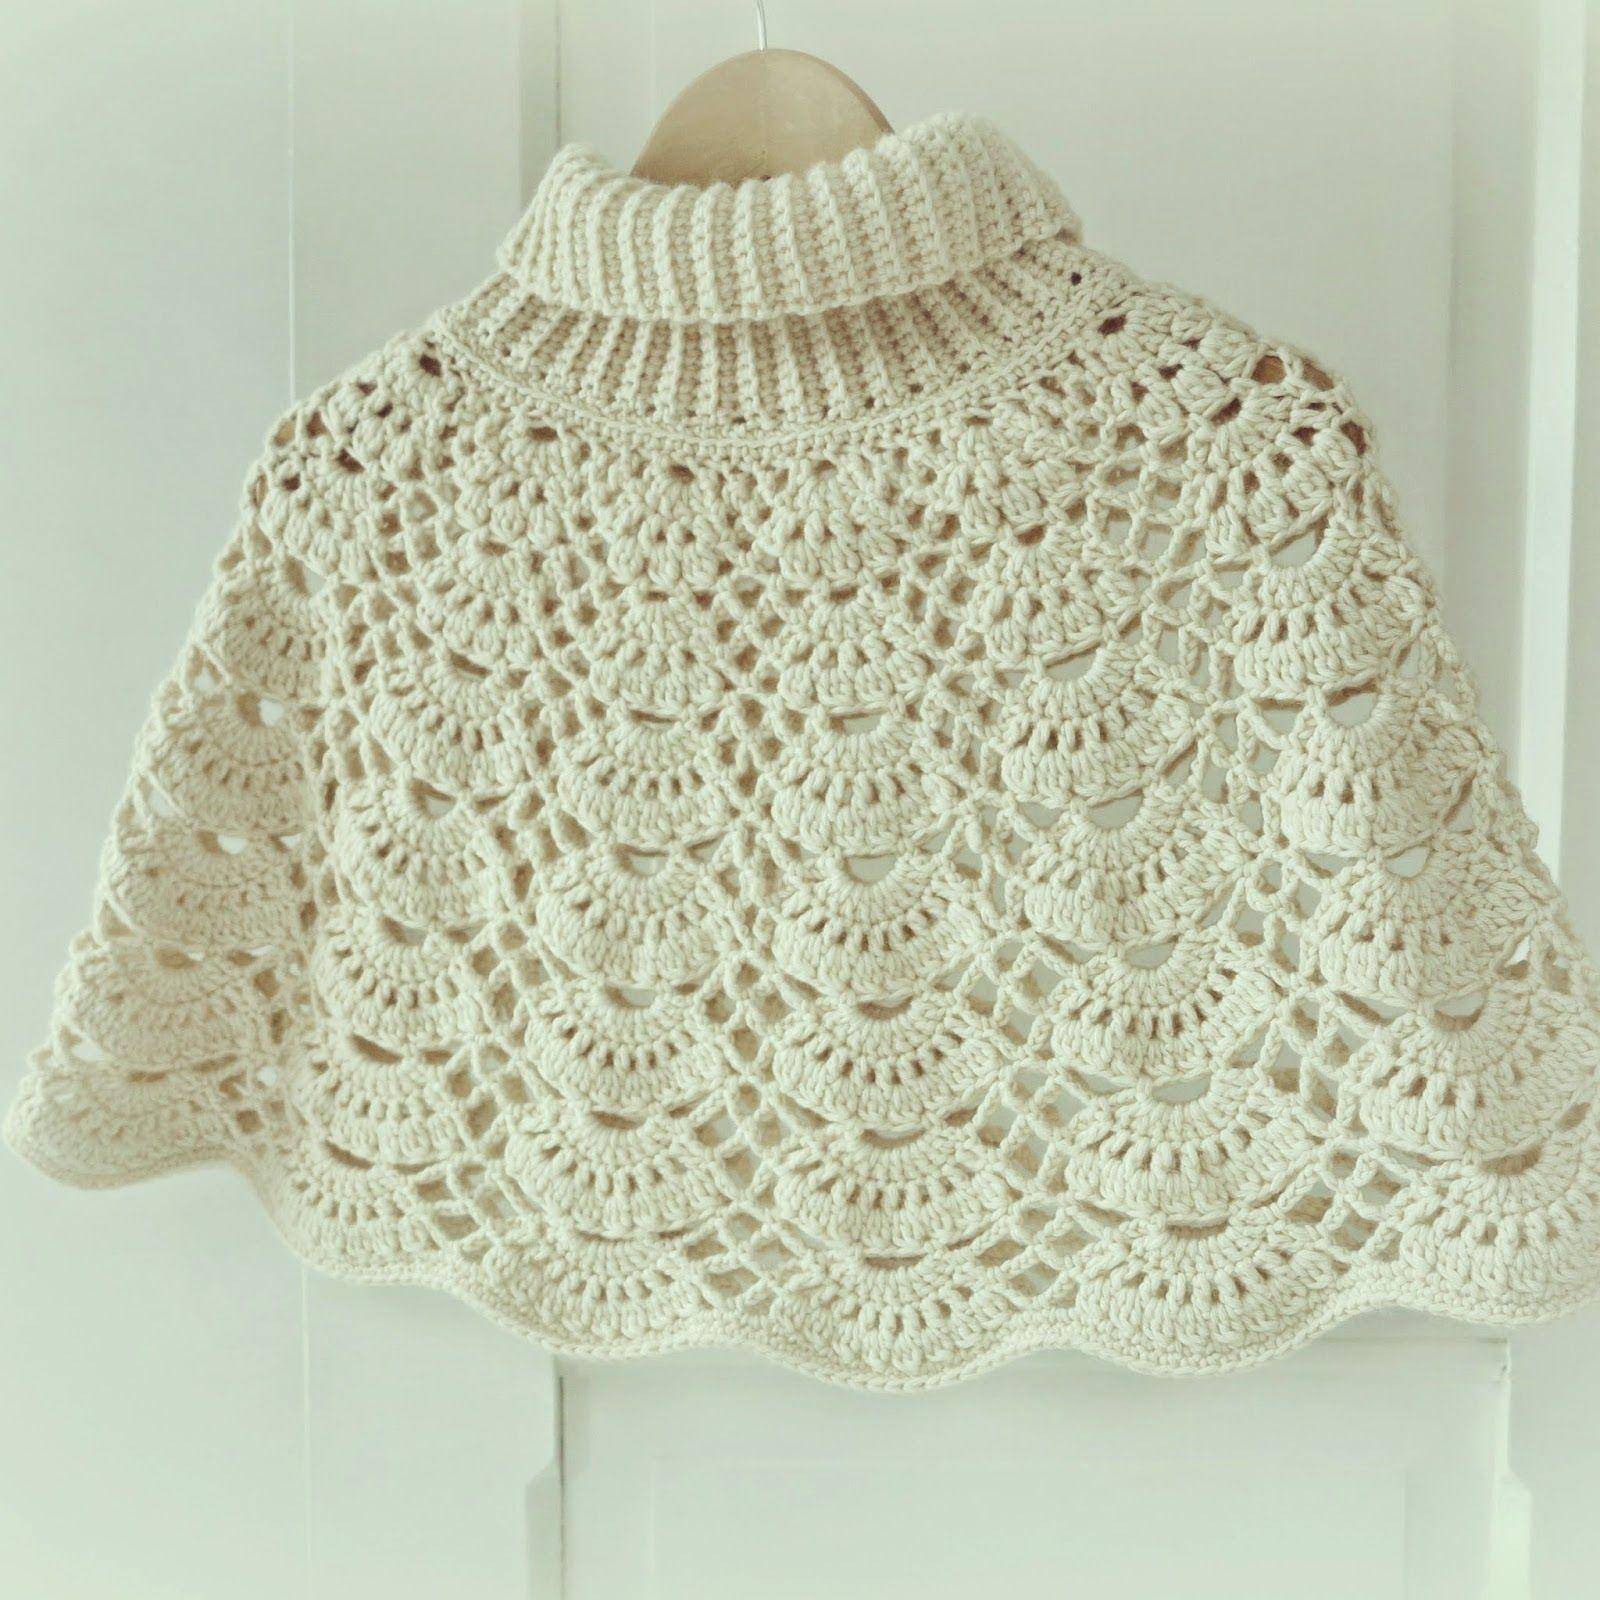 ByHaafner, Japanese crochet pattern, crochet cape   ผ้าคลุมไหล่โครเช ...